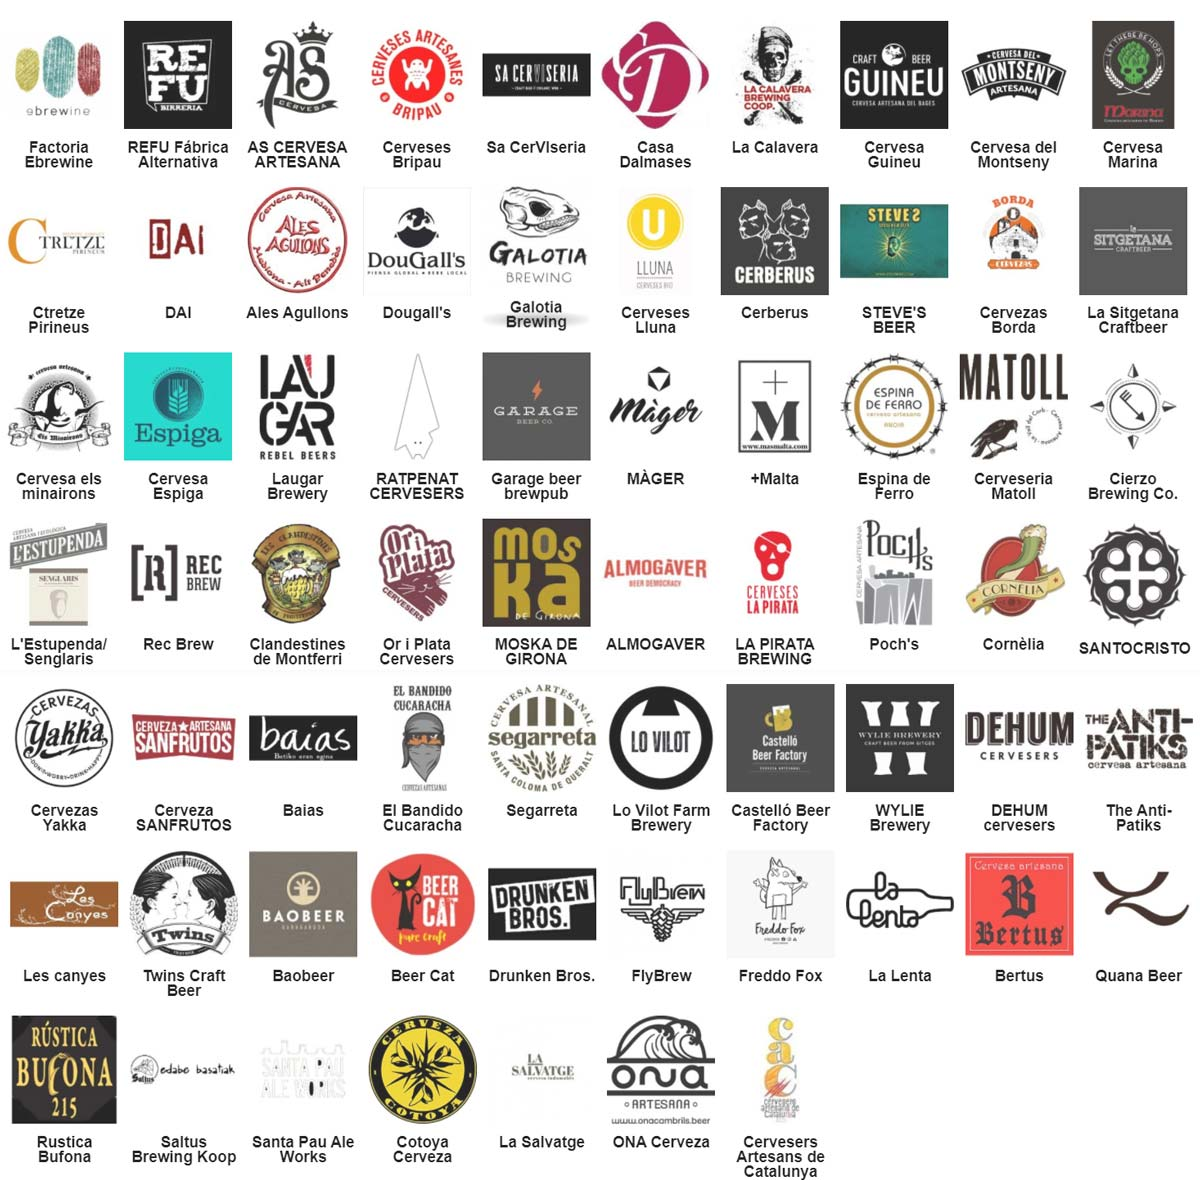 Cerveceras participantes en la Mostra Mediona 2021